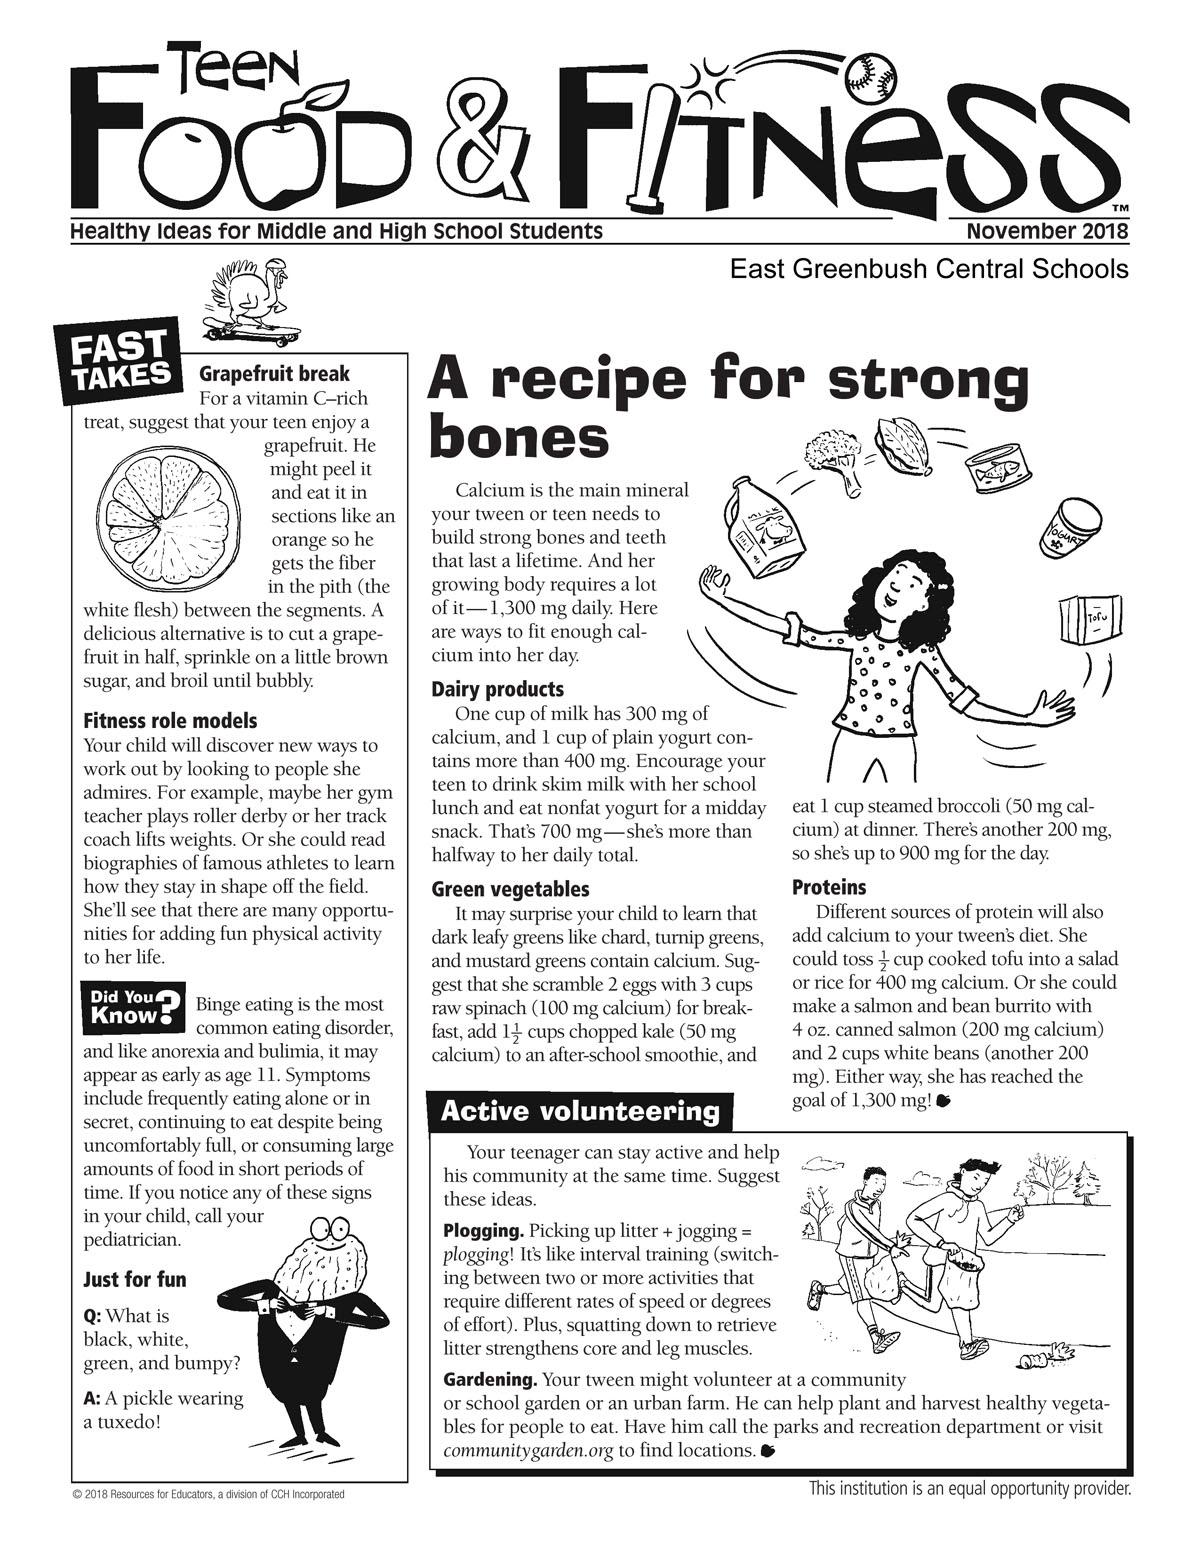 November issue of Food & Fitness newsletter